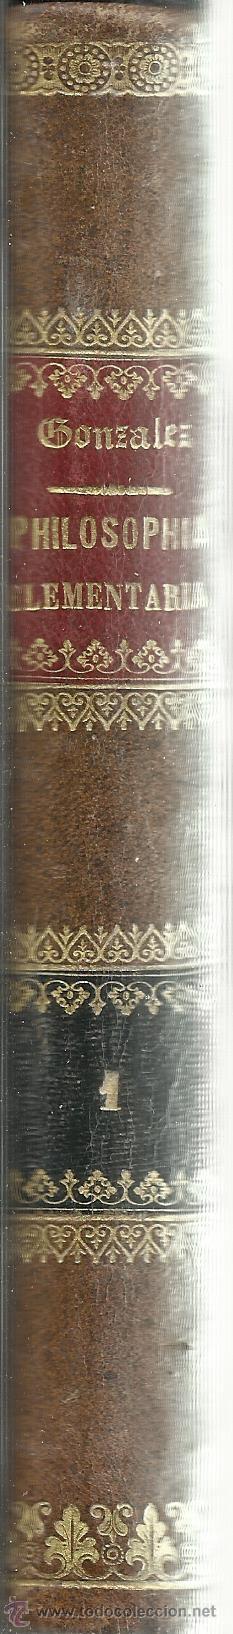 Libros antiguos: PHILOSOPHIA ELEMENTARIA. ZEPHYRINI GONZALEZ. VOLUMEN I. 7ª EDICION. 1891 - Foto 2 - 49861176